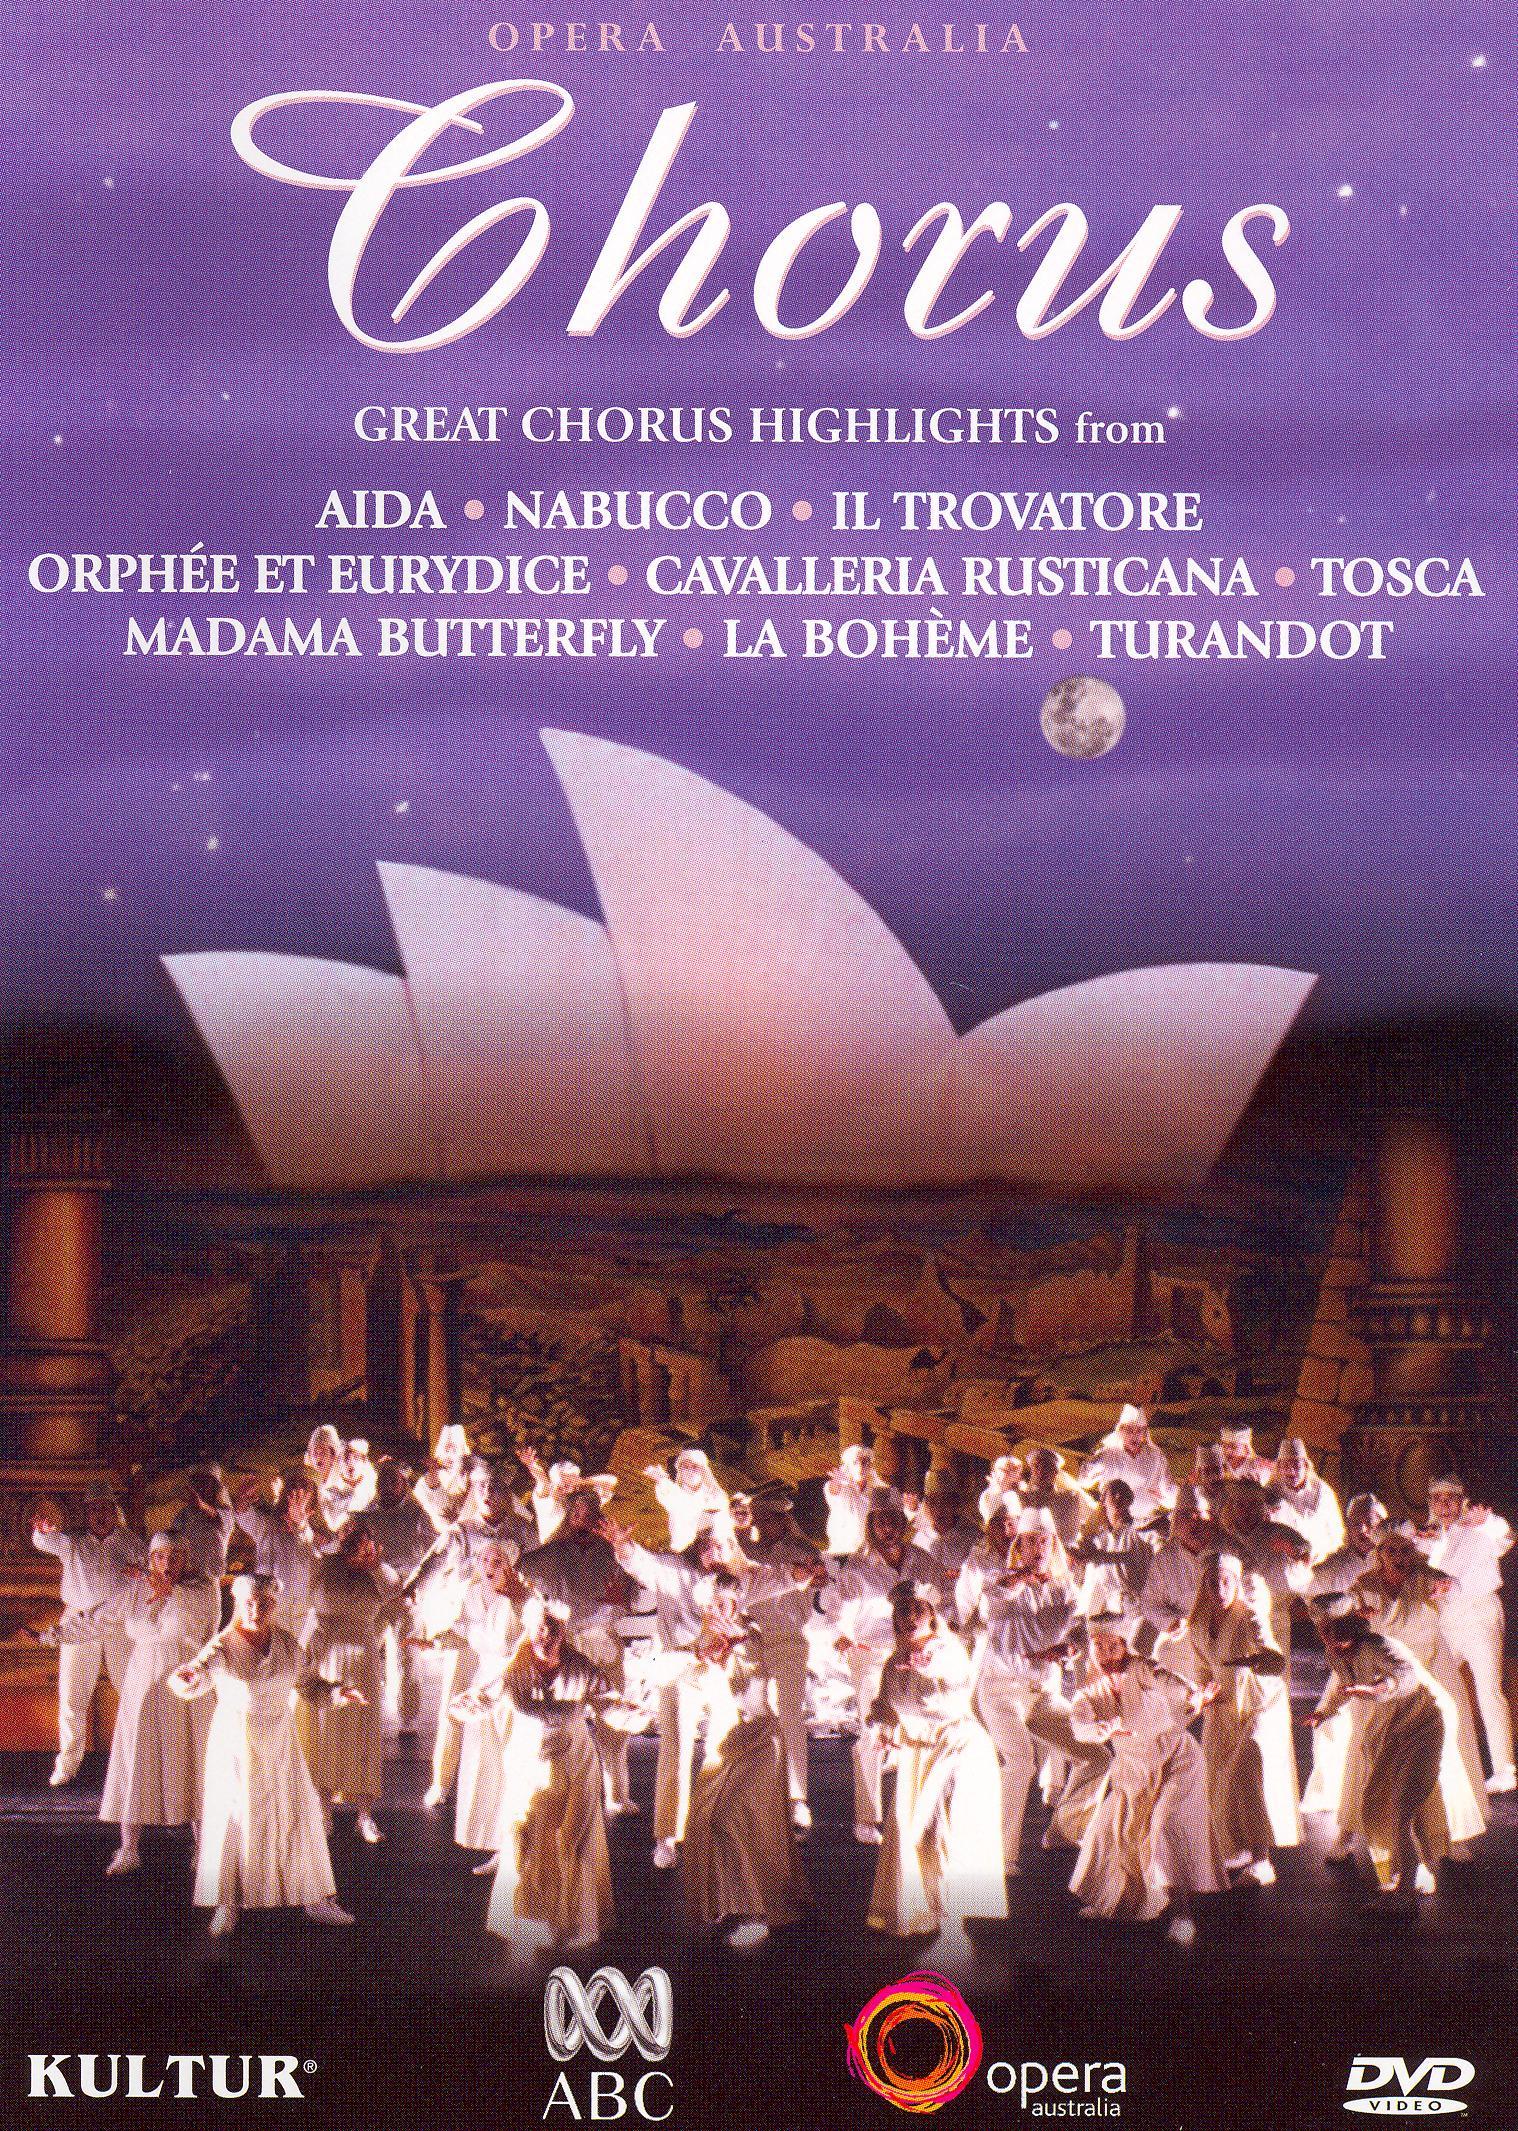 Opera Australia: Chorus